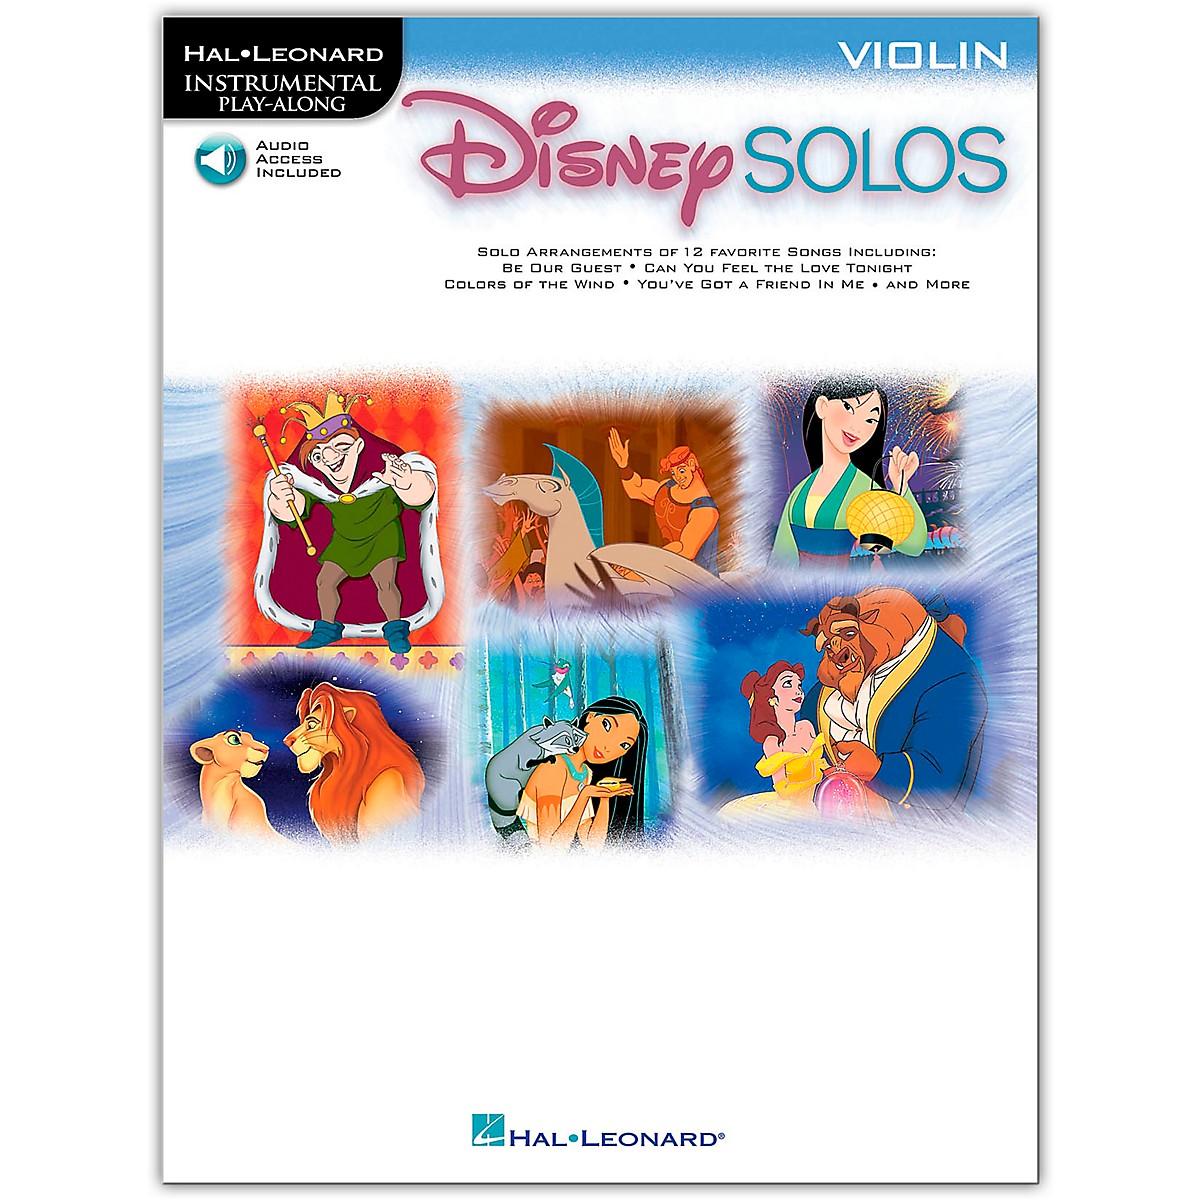 Hal Leonard Play-Along Disney Solos Book with Online Audio Violin